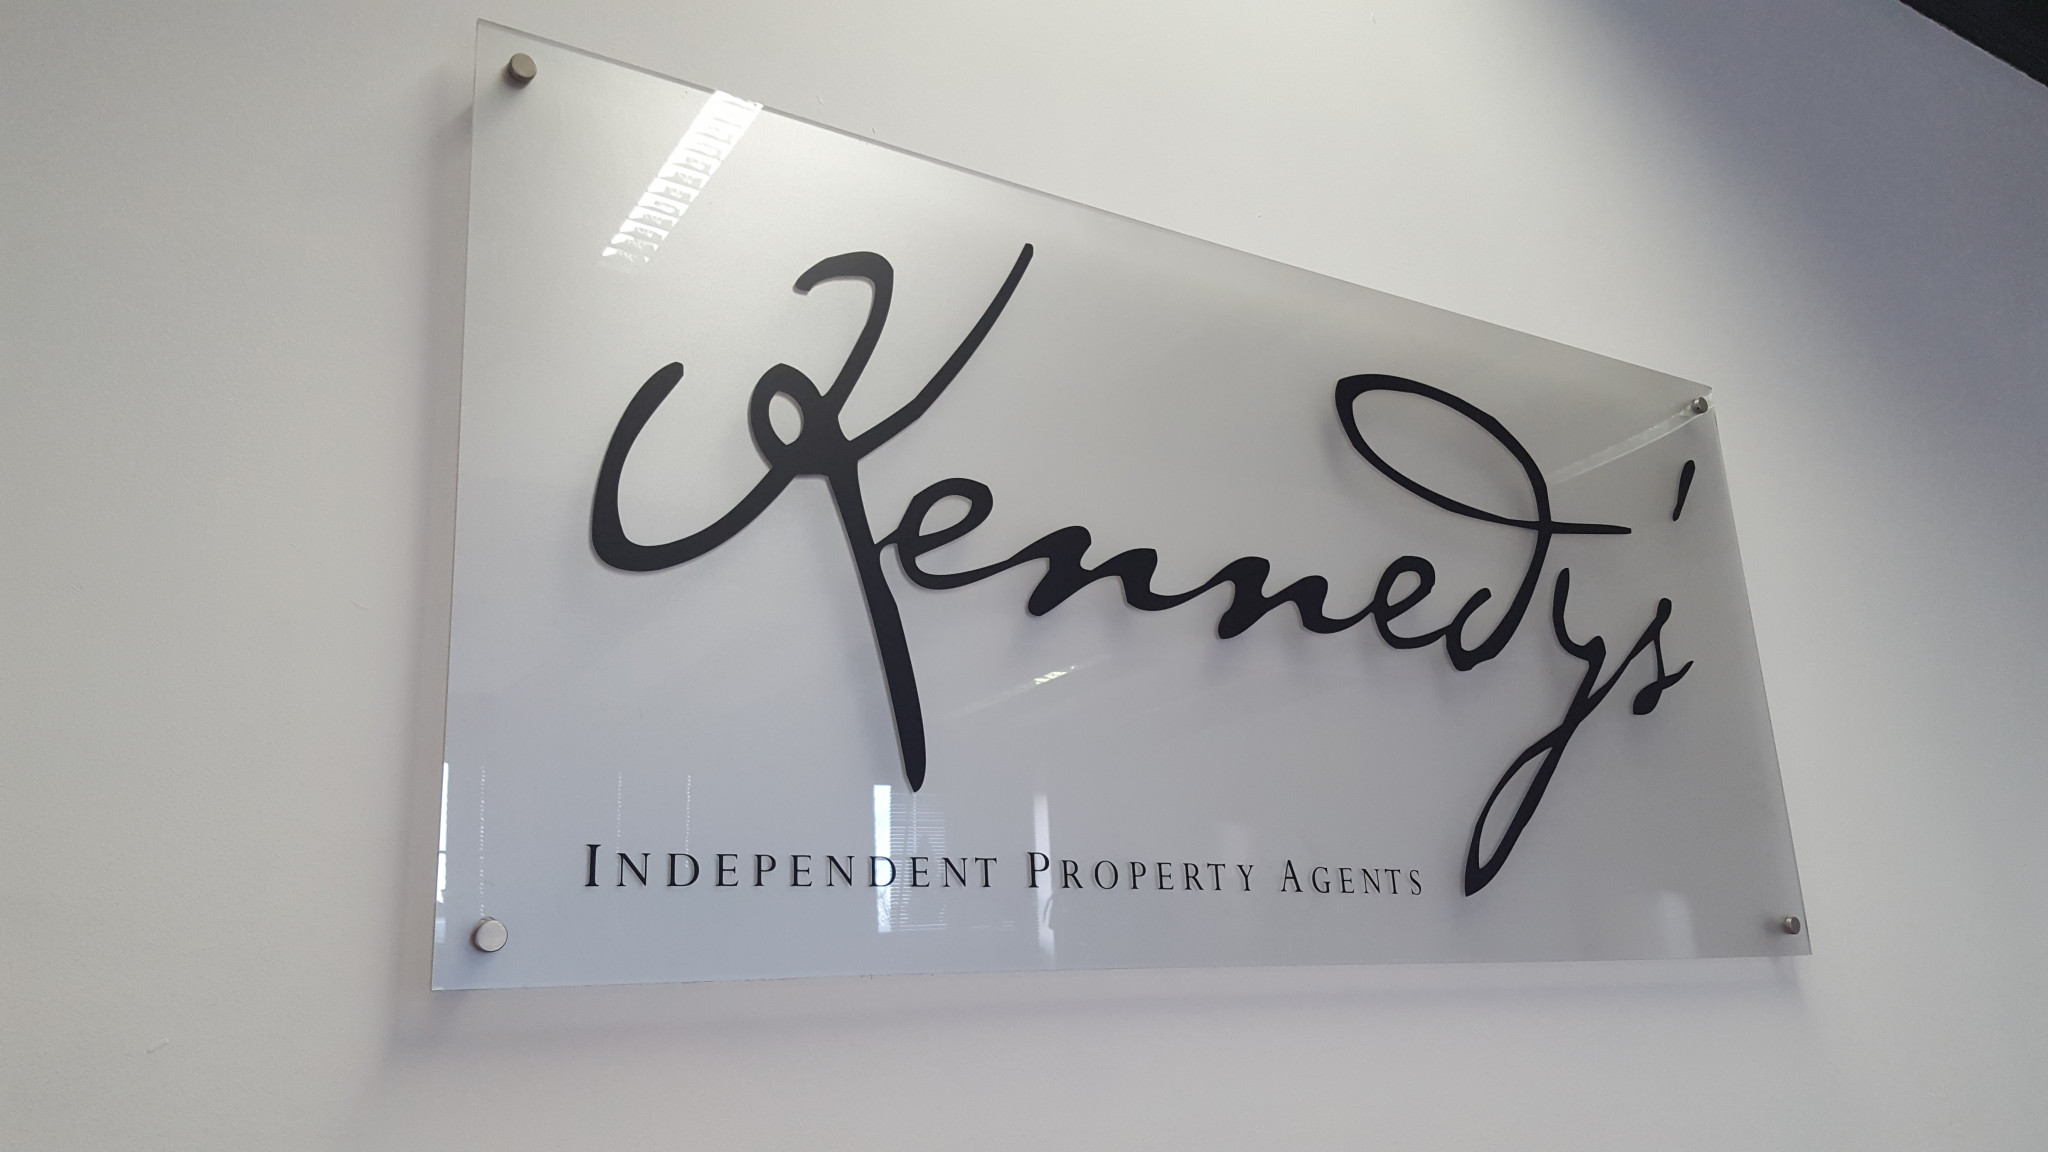 kennedys_logo_at_walton